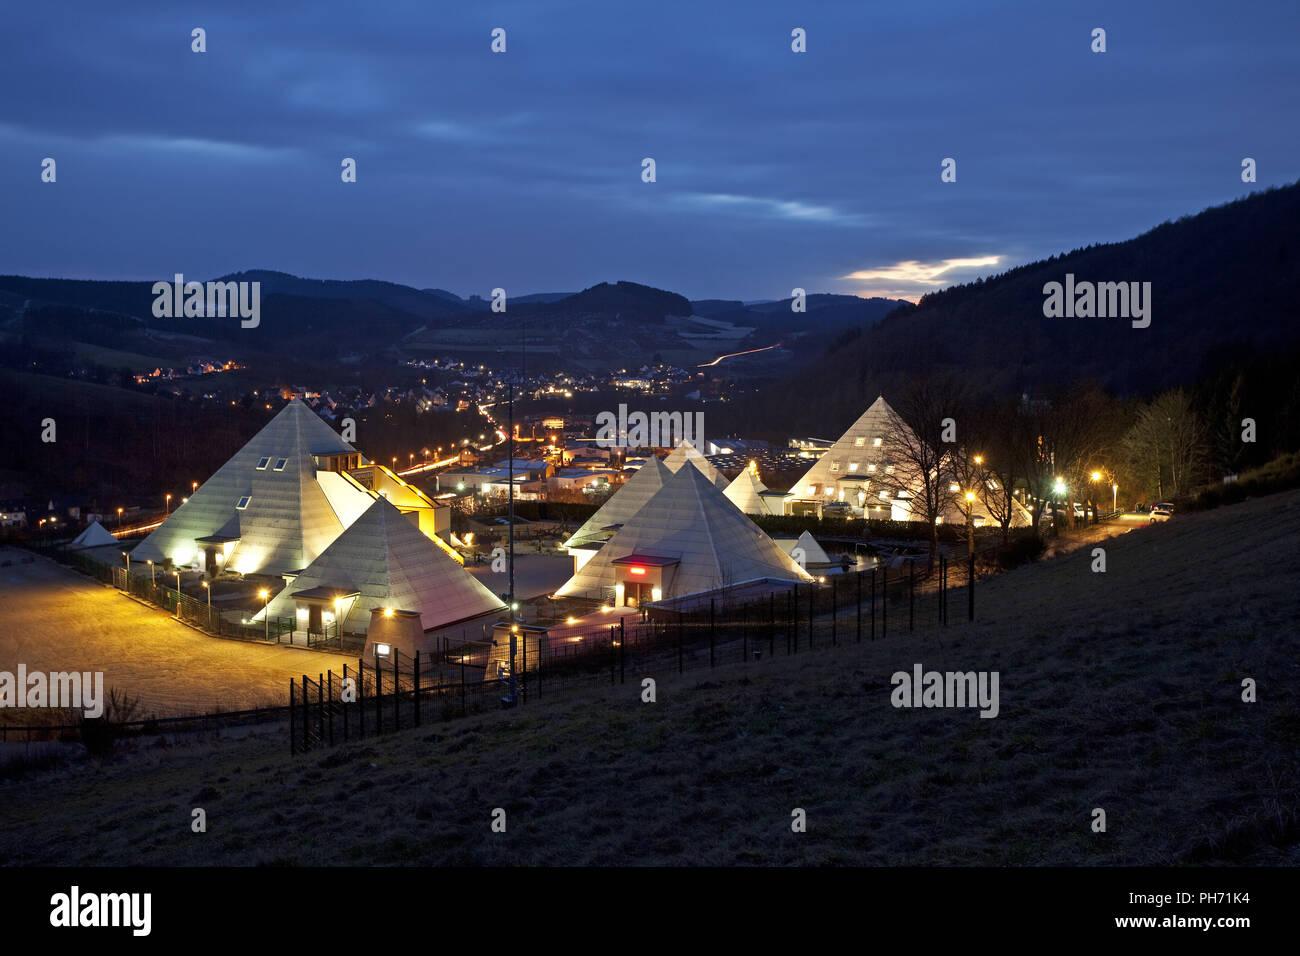 The Sauerland Pyramids in Meggen in Lennestadt. Stock Photo